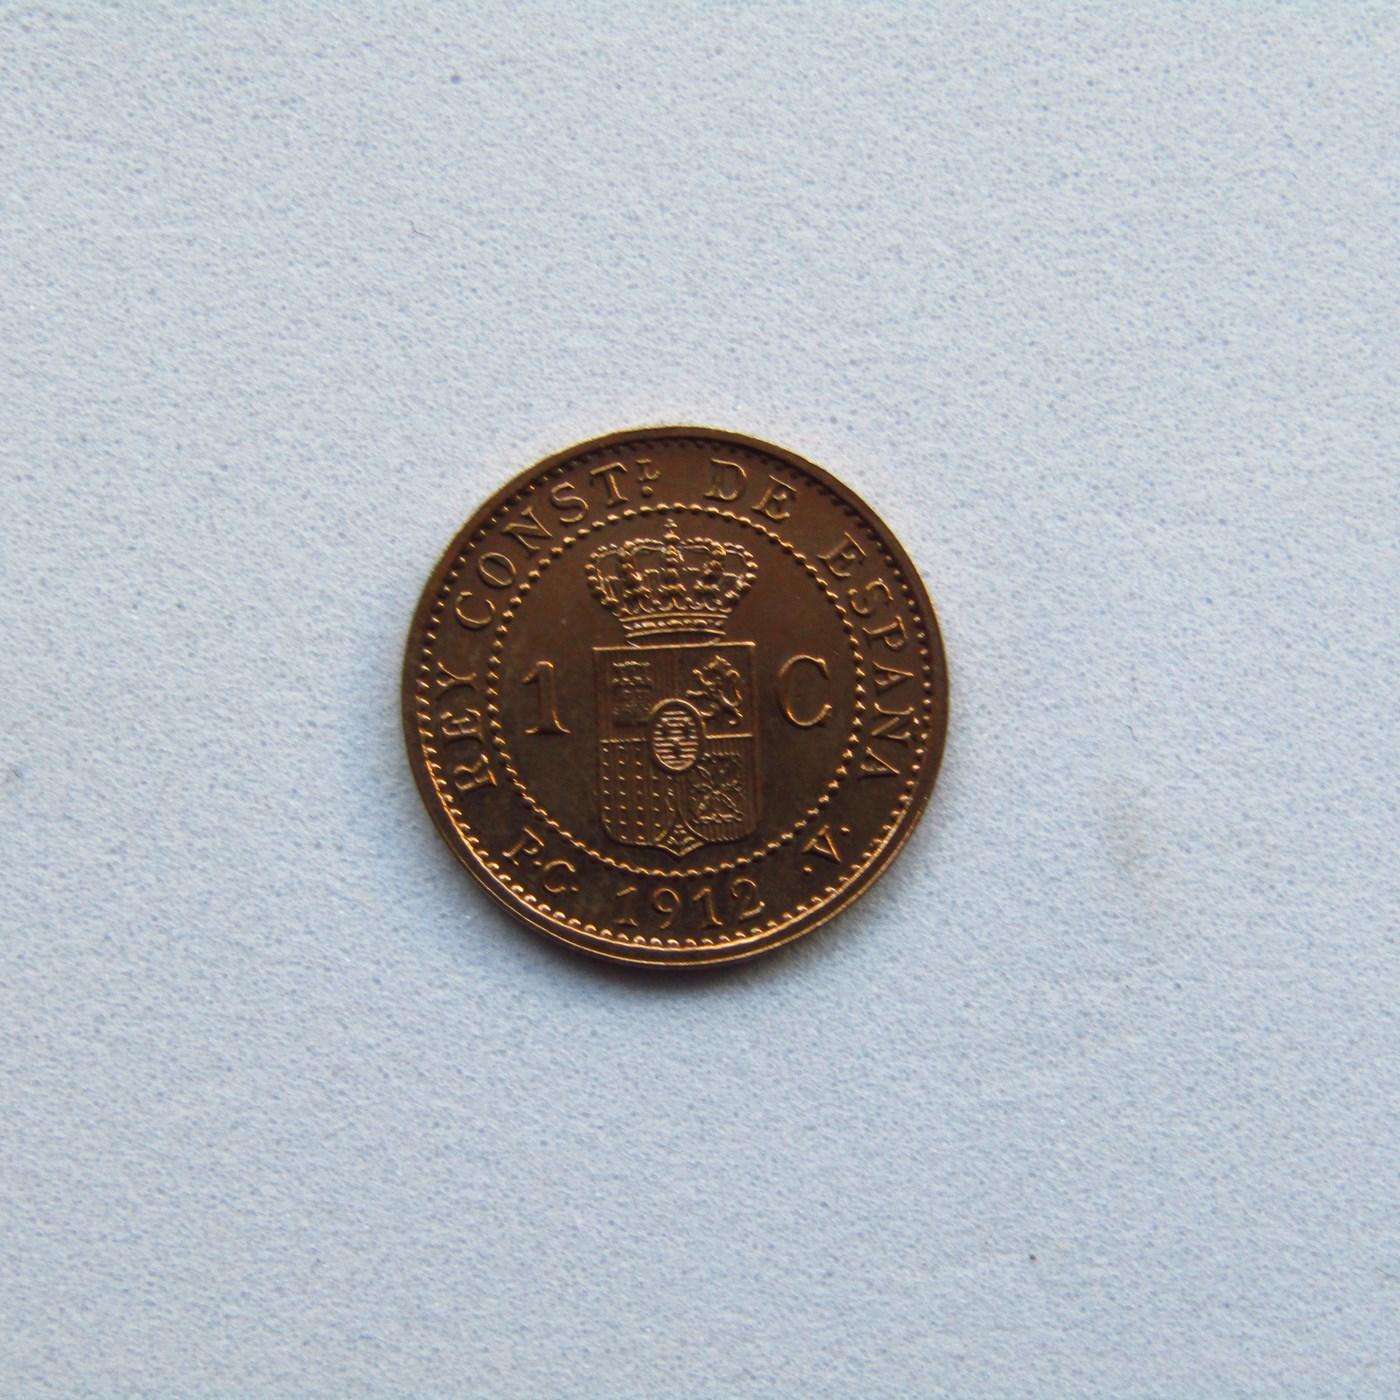 Moneda de UN CENTIMO. COBRE. Año 1912 ALFONSO XIII.(*2) S/C.